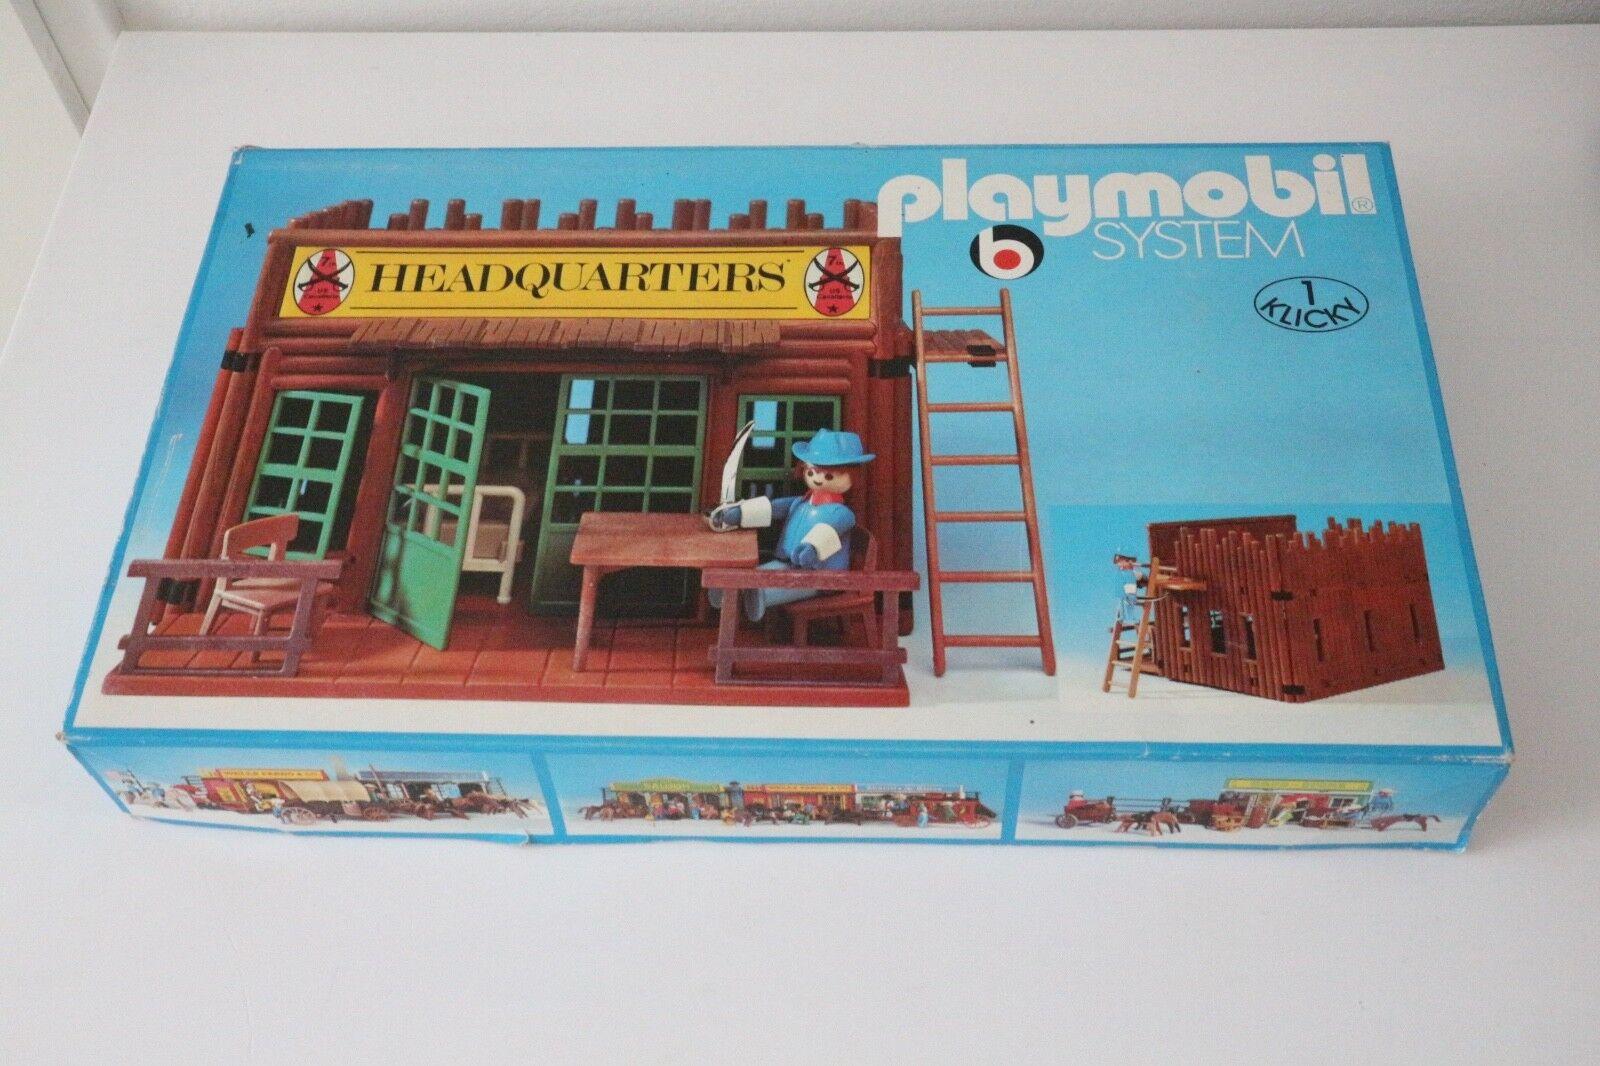 Playmobil 3429 setnr.nya neu nouveau västliga klibbiga huvudbyggnader, fort, union